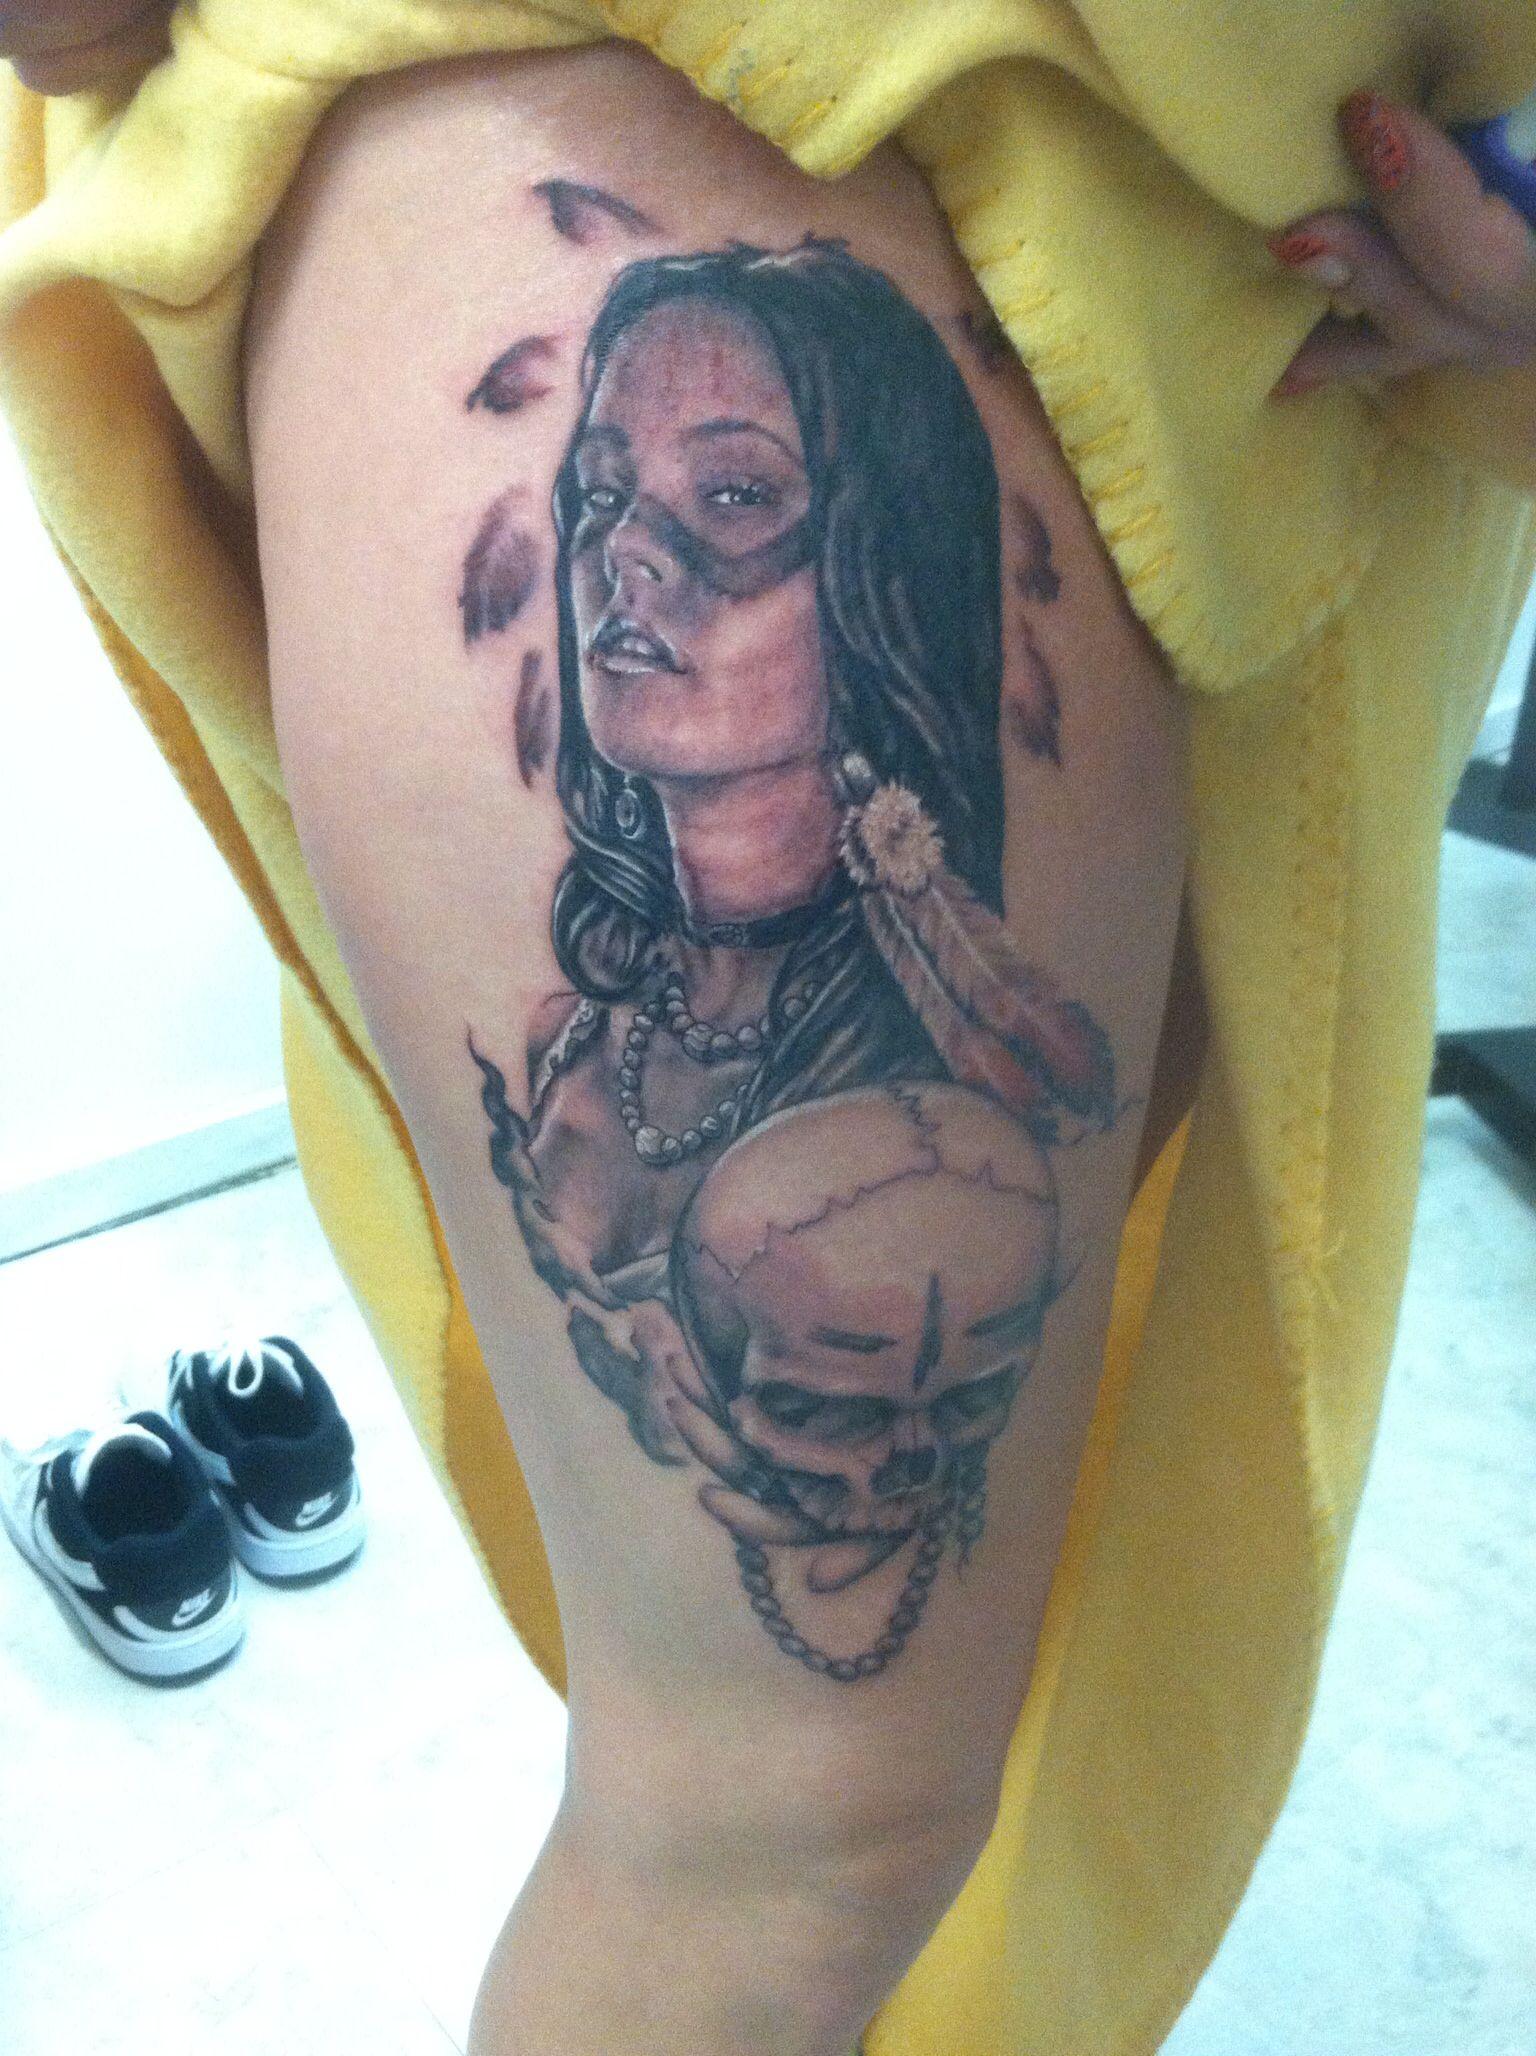 American Beauty Tattoos : american, beauty, tattoos, Native, American, Beauty, Tattoo, Chris, Hornsby, Beauty,, Tattoos